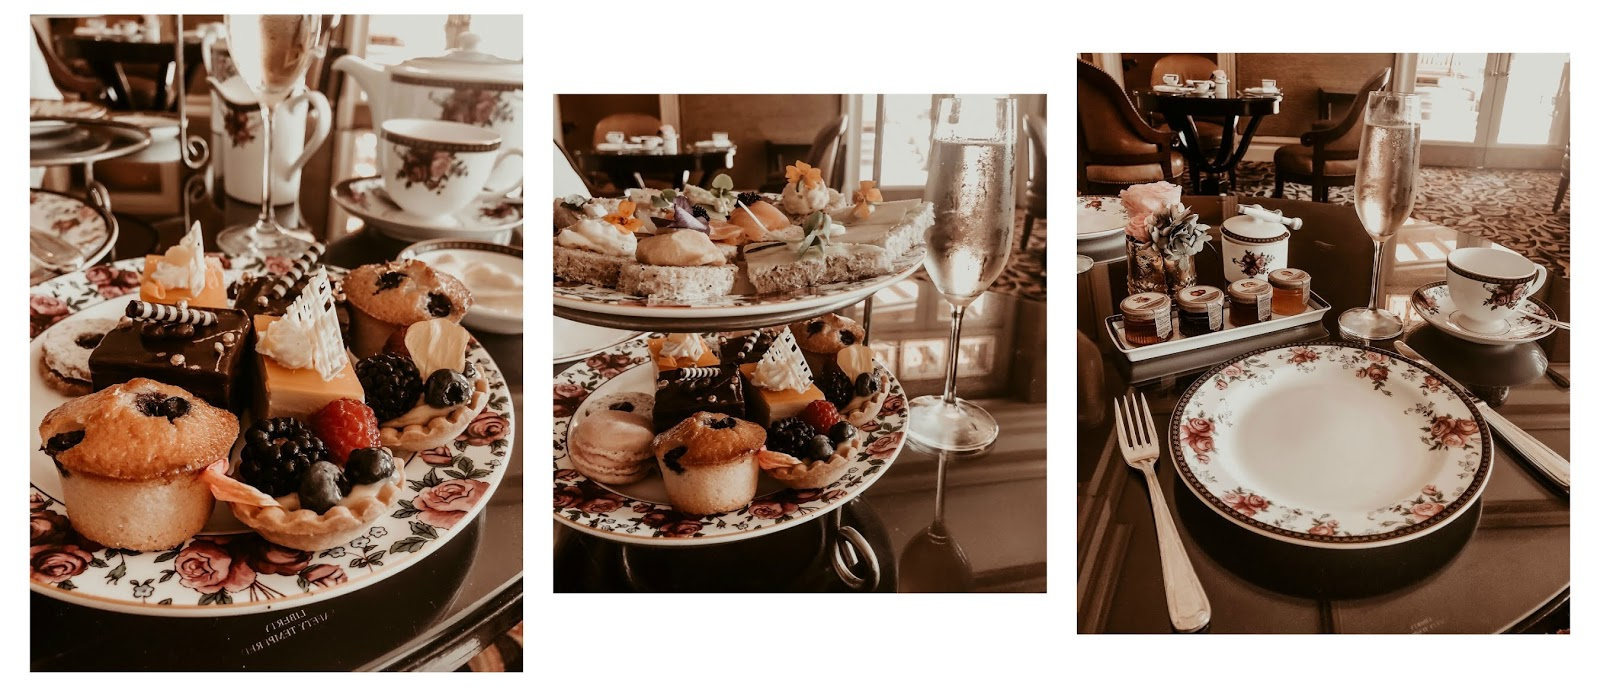 afternoon-high-tea-at-the-langham-huntington-hotel-pasadena-california